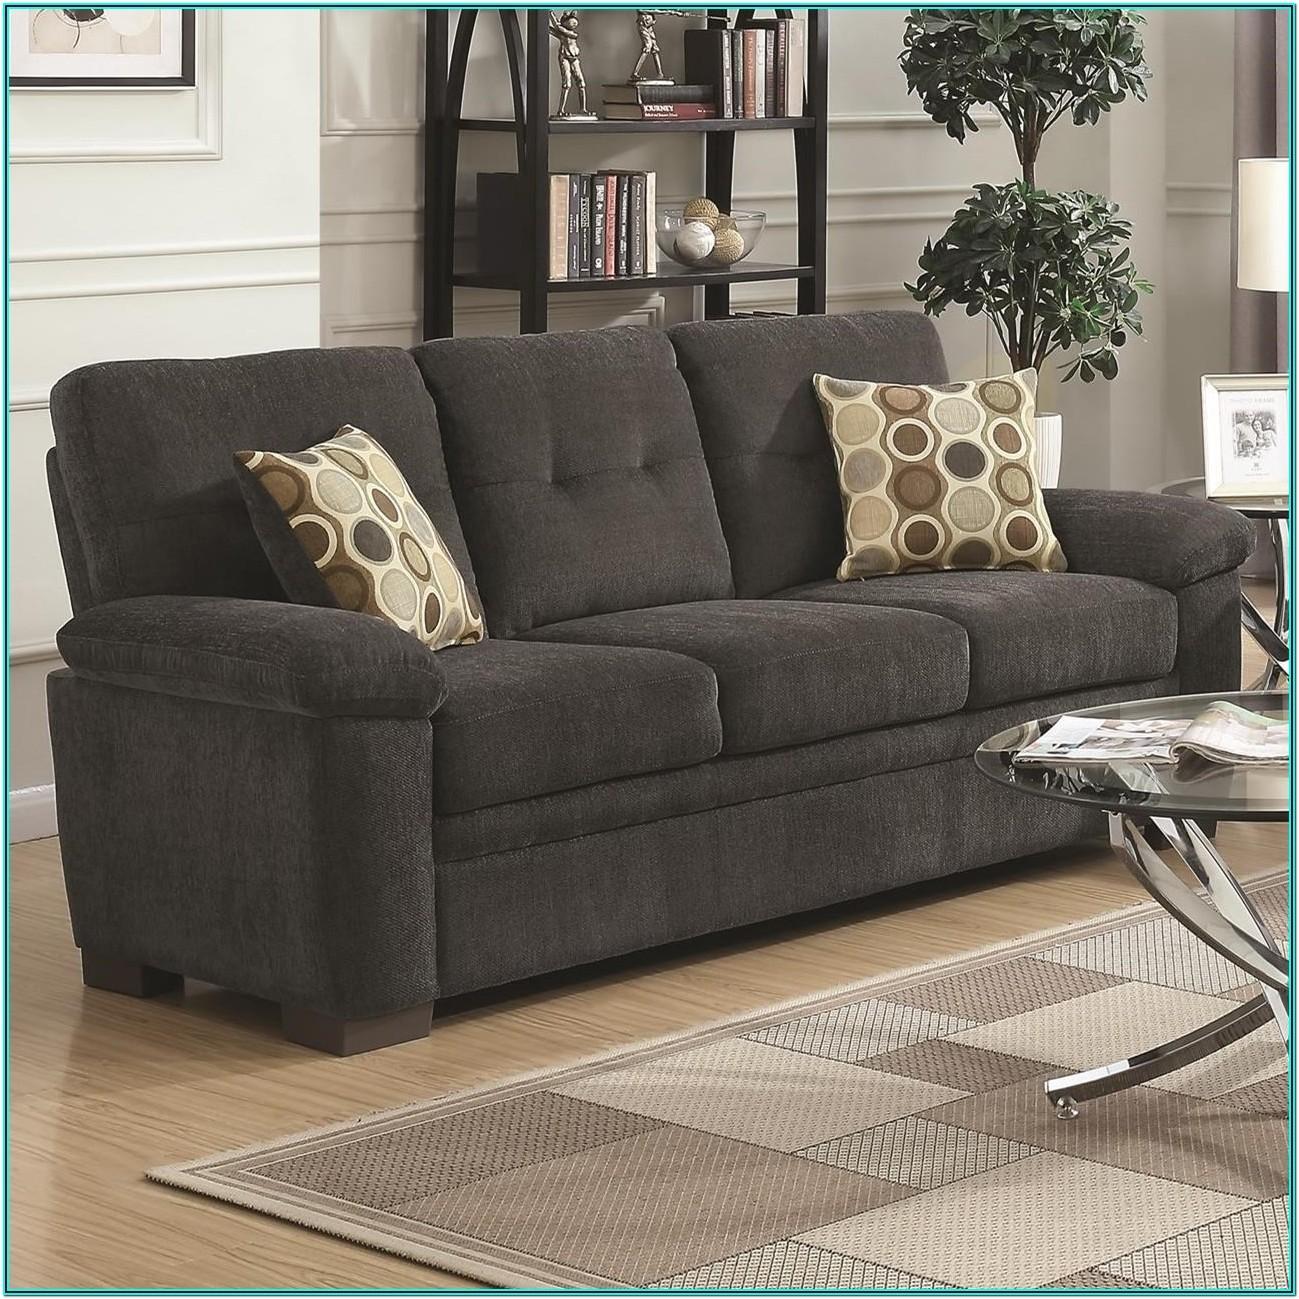 Living Room Value City Furniture Near Me